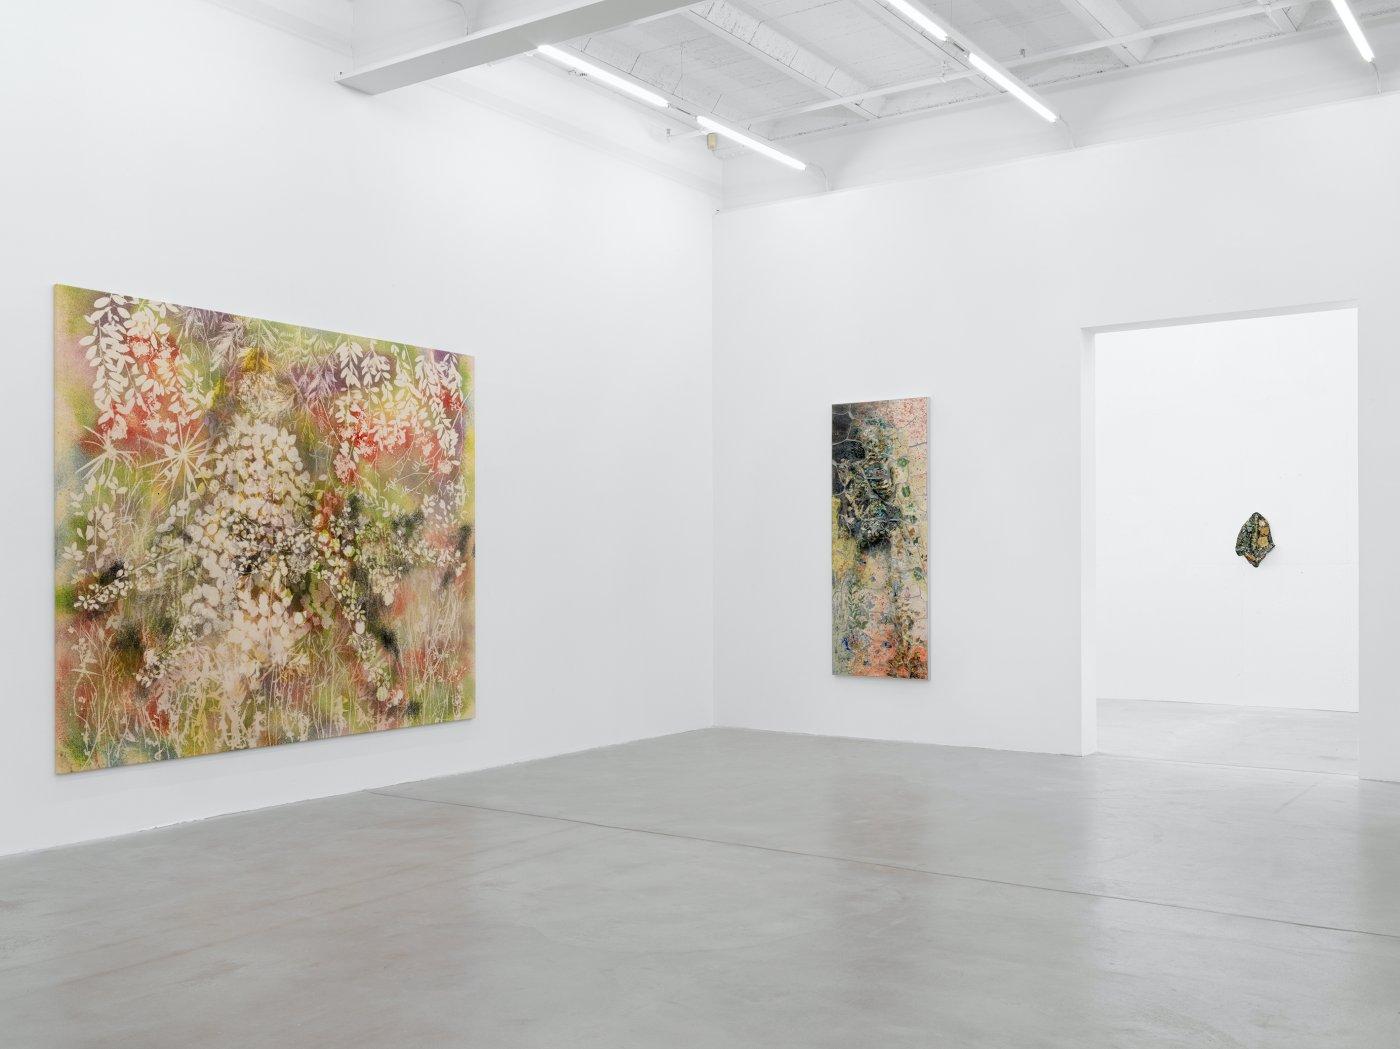 Galerie Eva Presenhuber Maag Areal Sam Falls 5